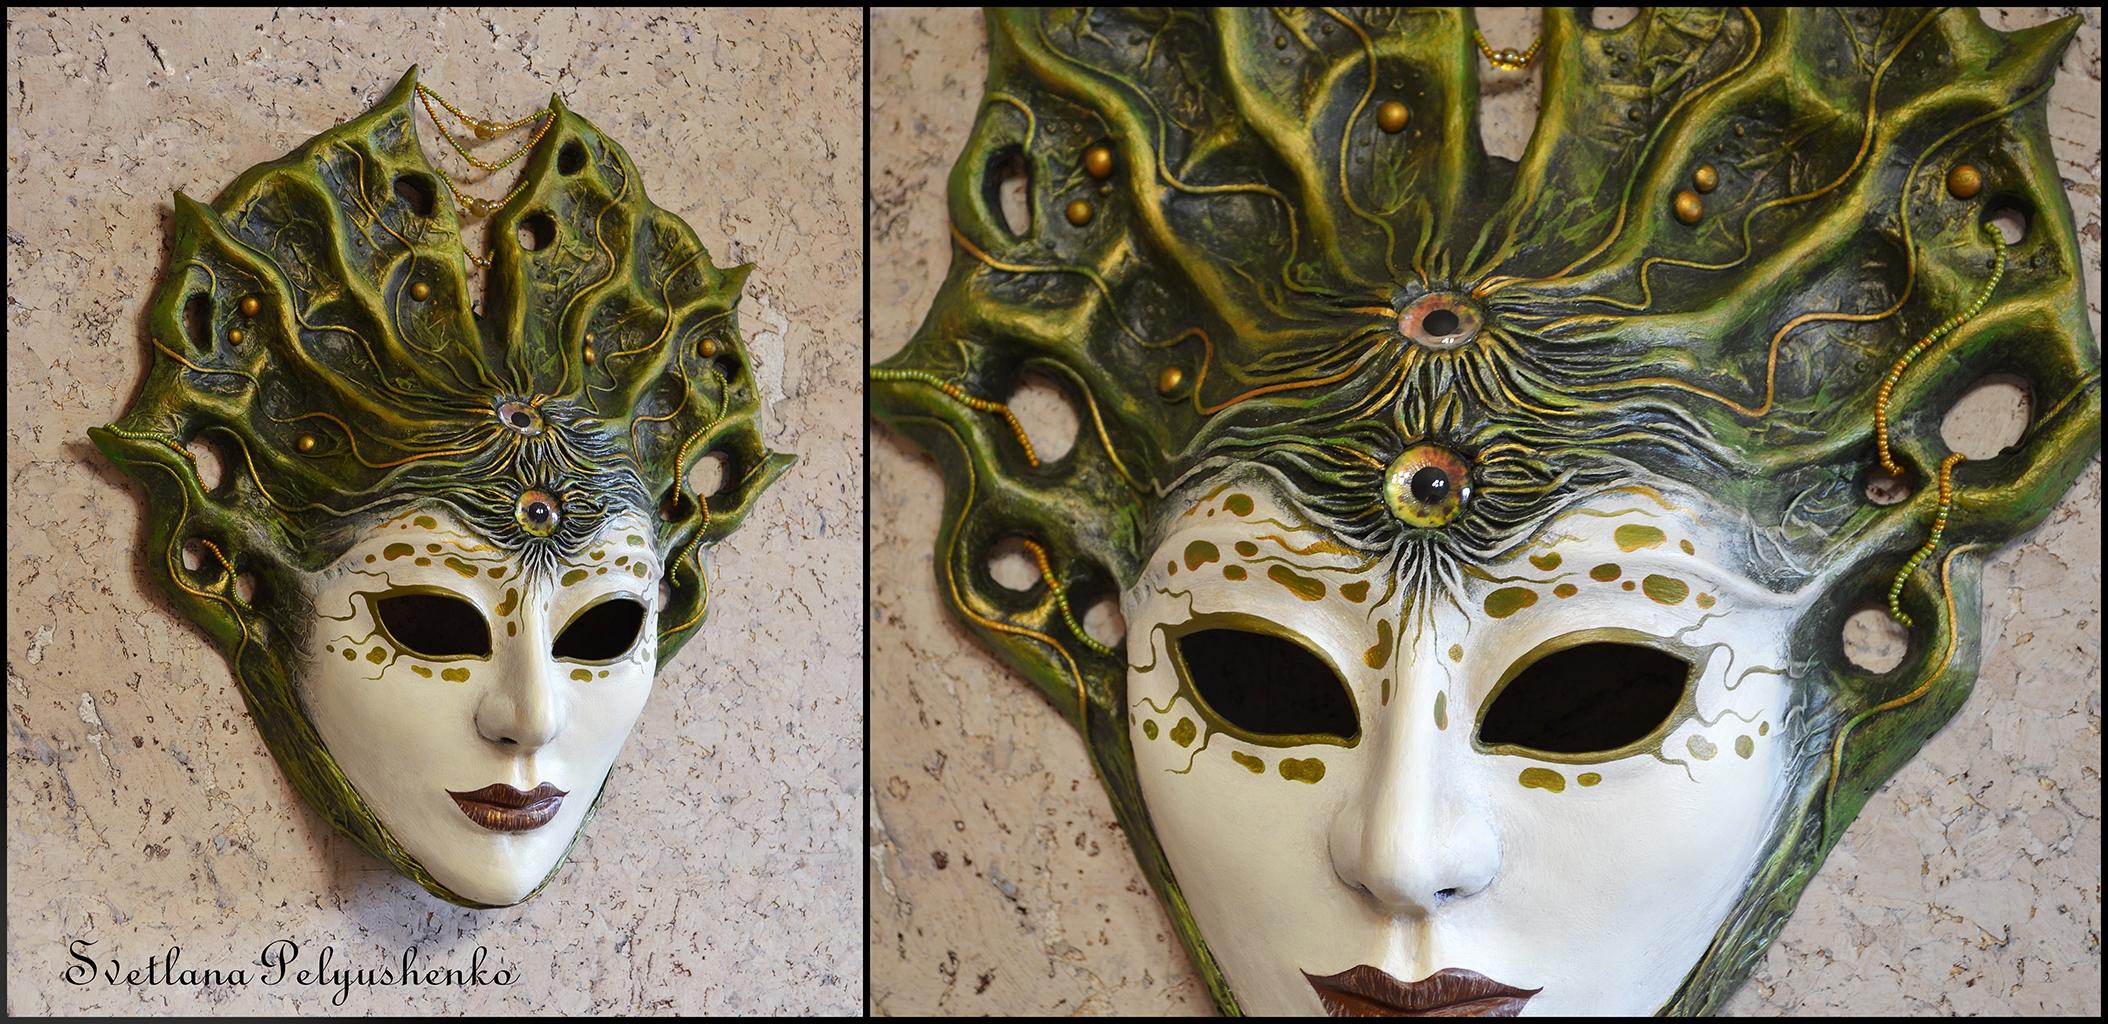 Paper and paper mache masks on mask makers deviantart for Paper mache mash